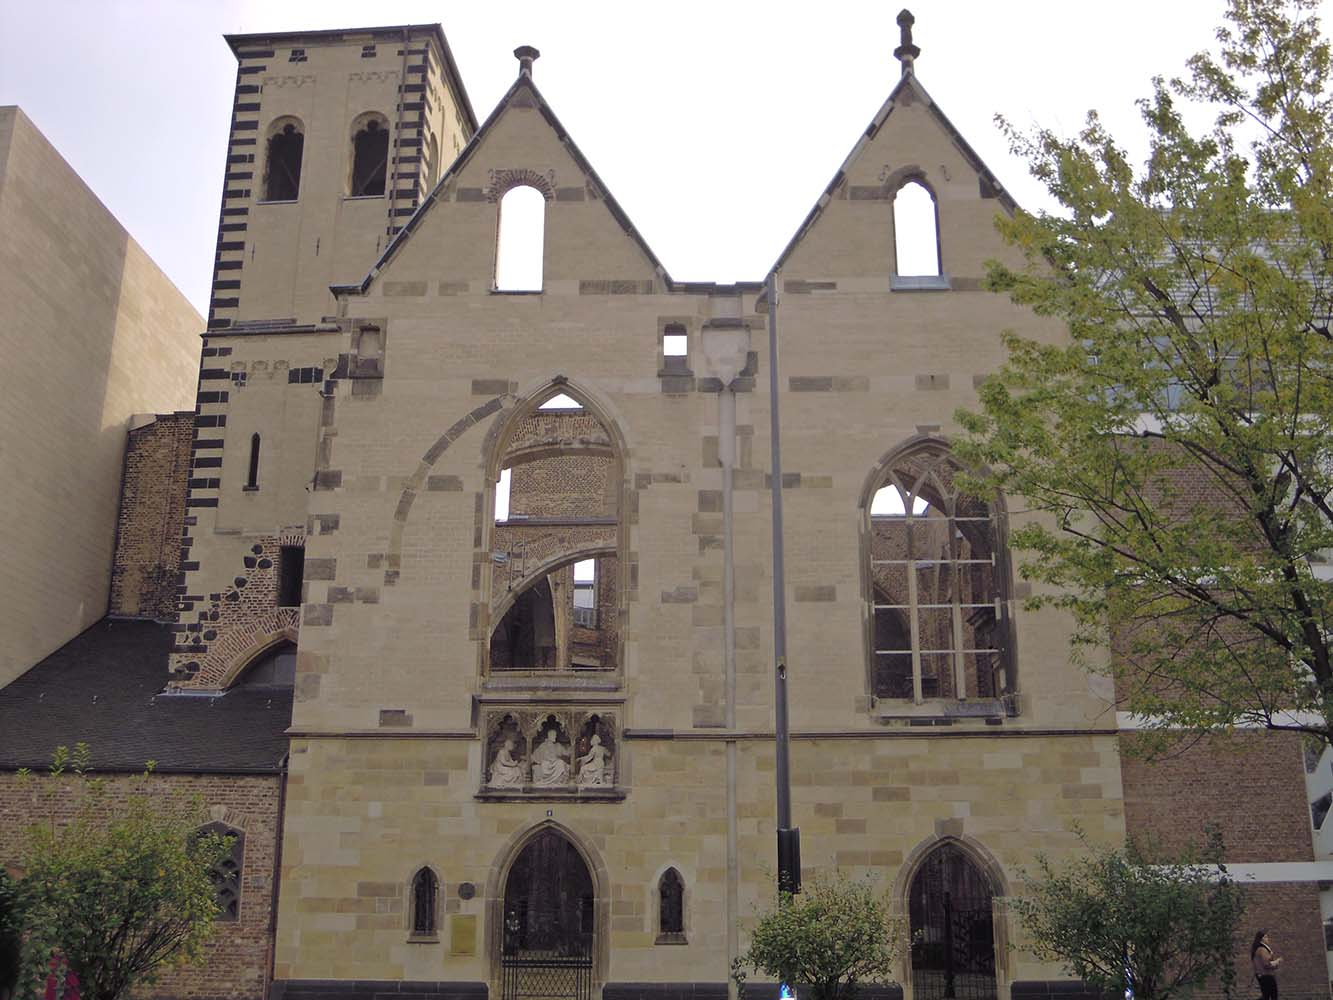 Keulen St. Alban treurende ouderpaar KK